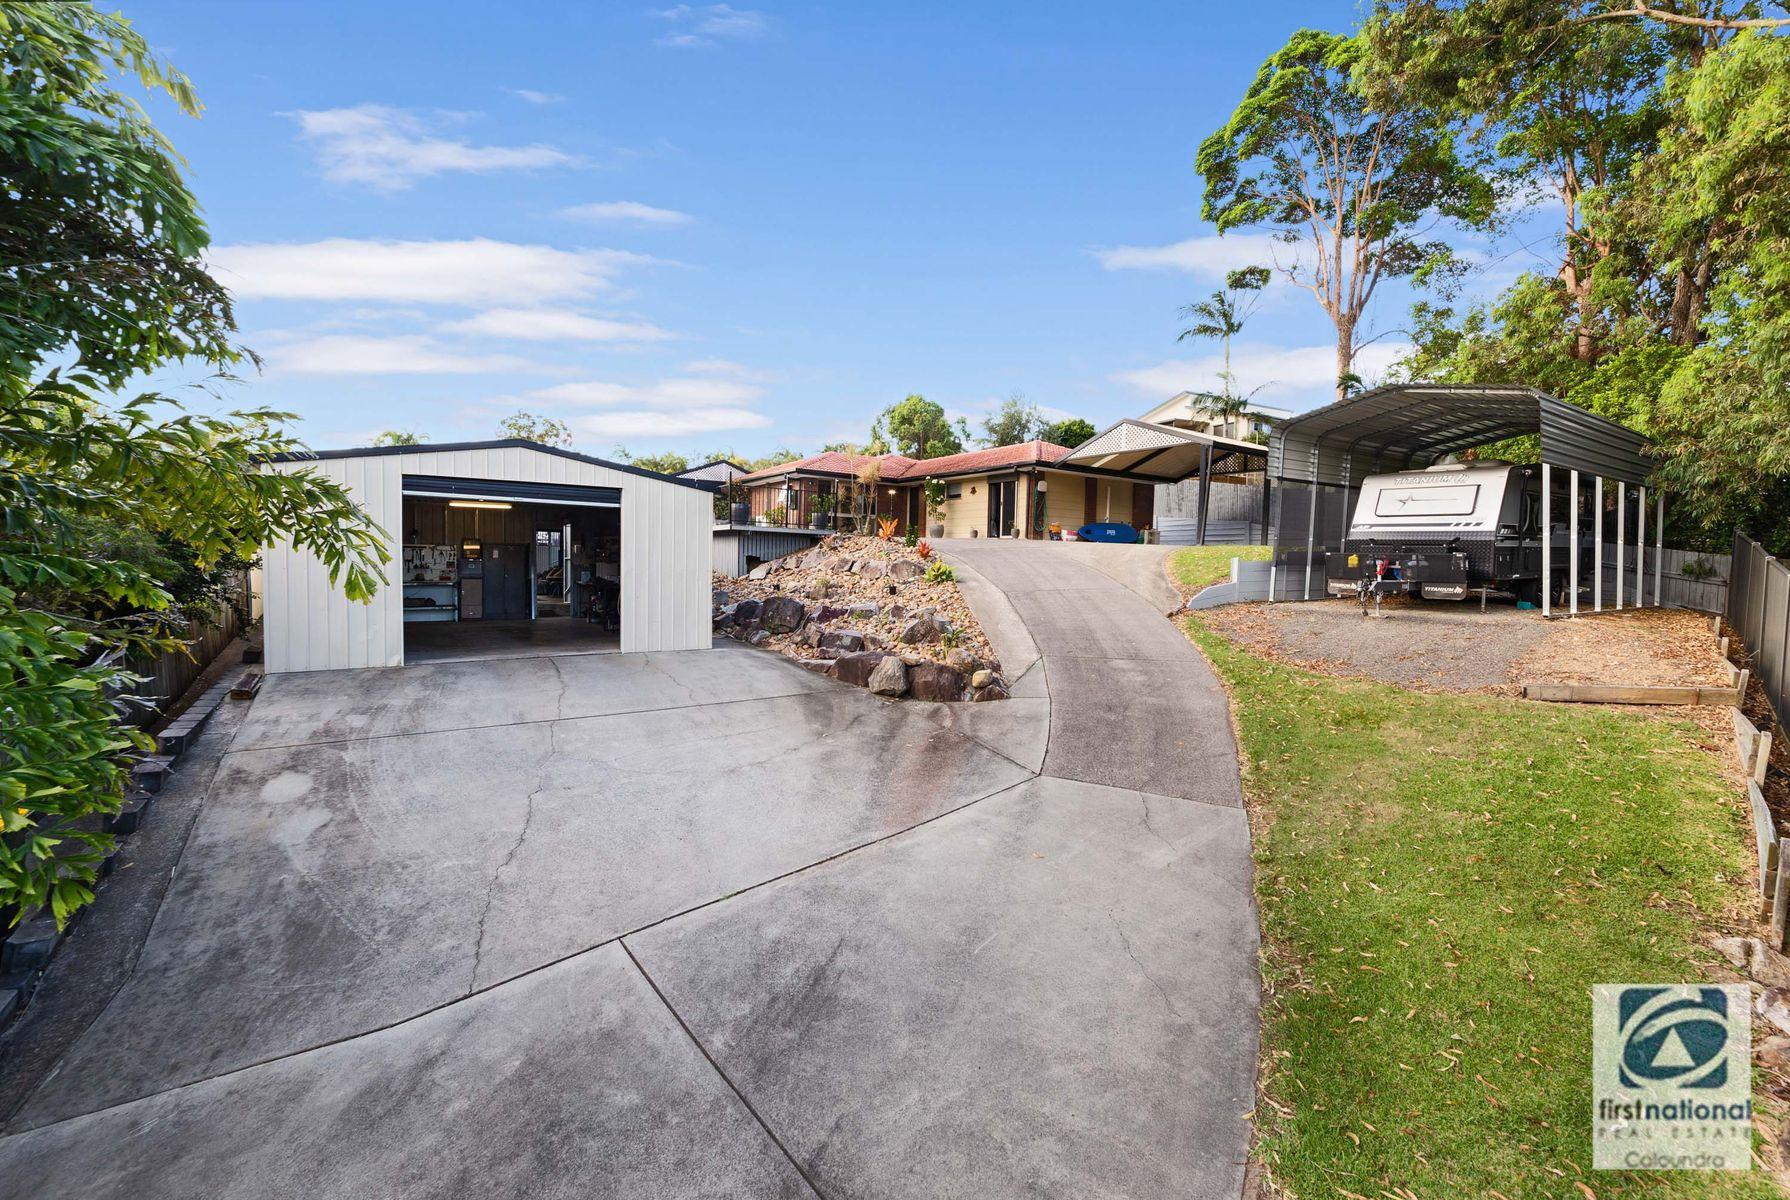 13 Heron Drive, Aroona, QLD 4551